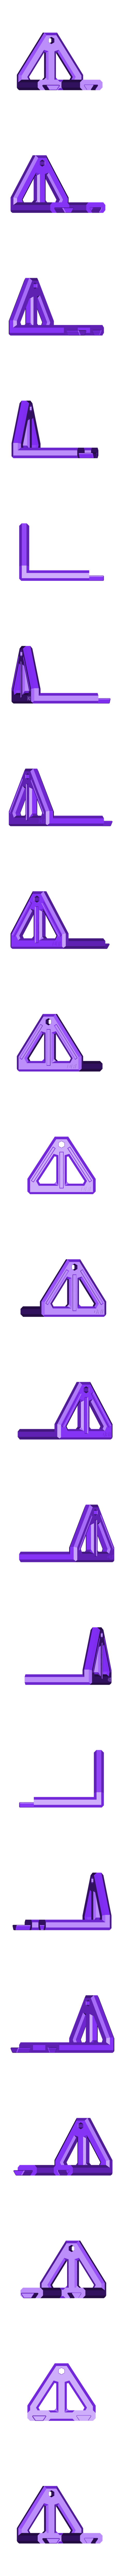 Clockwork base.stl Download free STL file Clockwork pen carousel • 3D printing template, EvolvingExtrusions